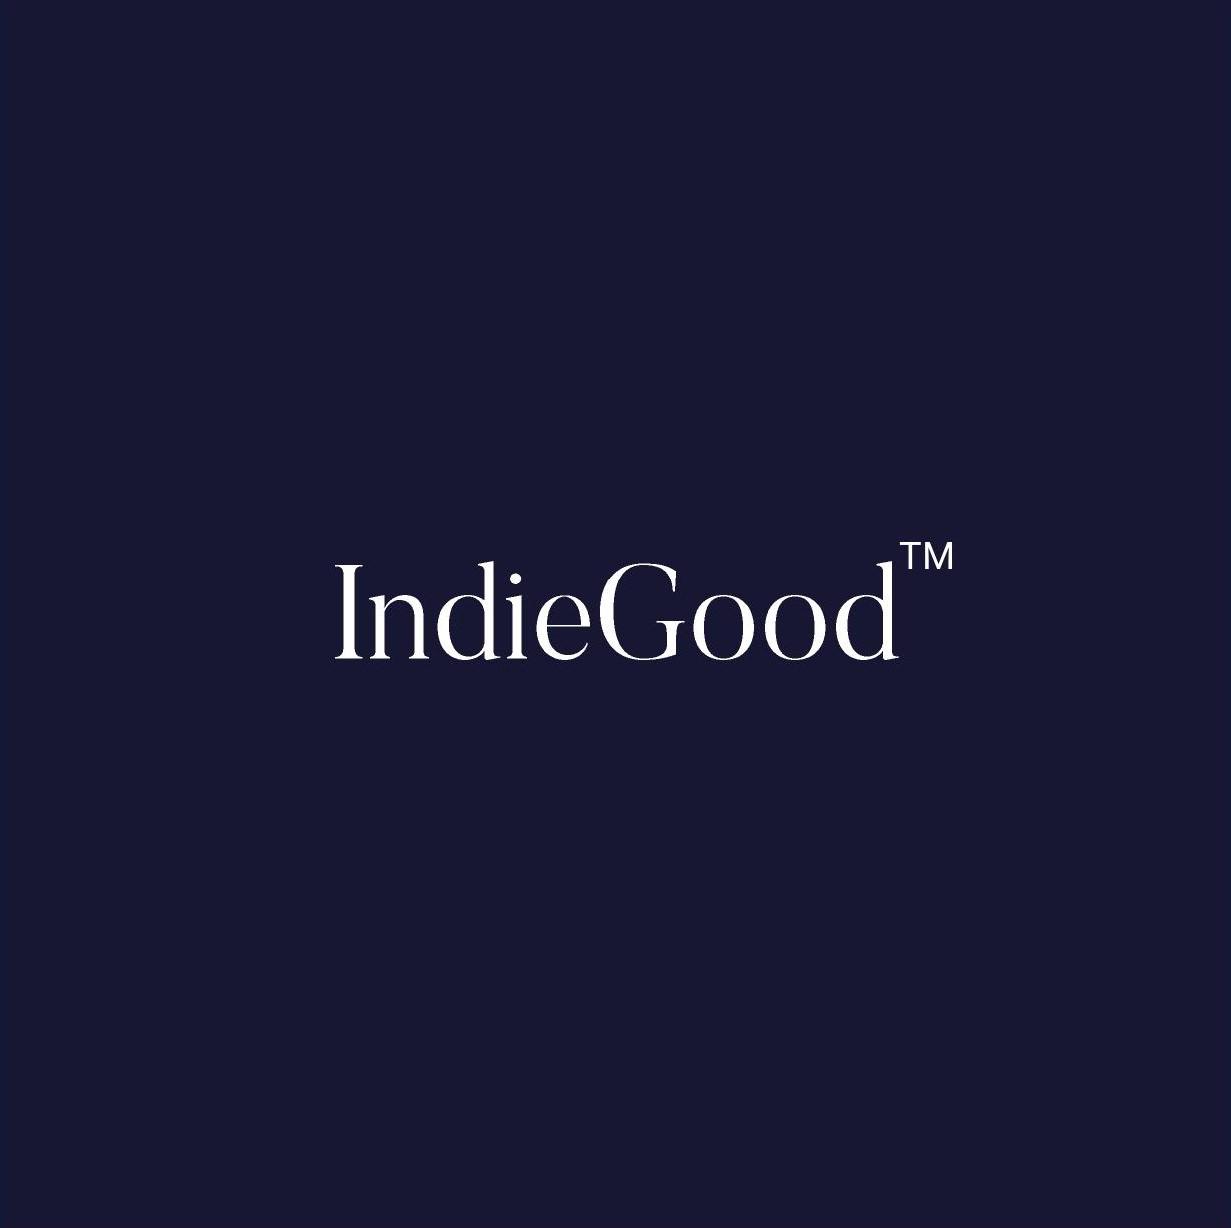 IndieGood